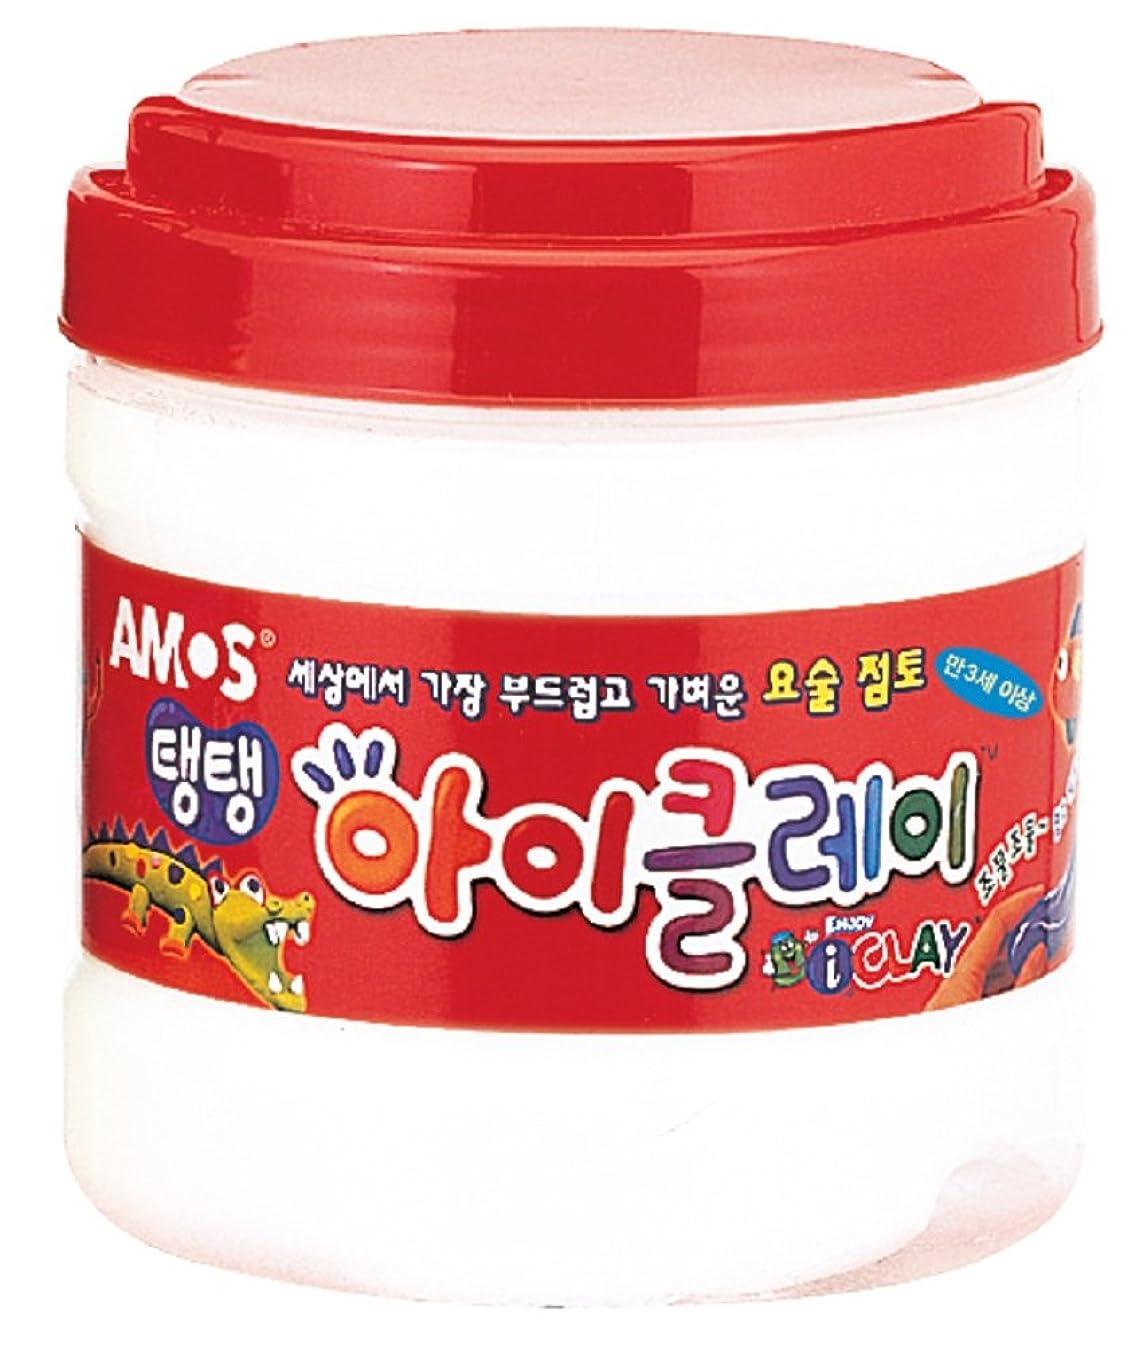 AMOS Clay 400g (14.1oz) Bucket 10 Single Color (White)